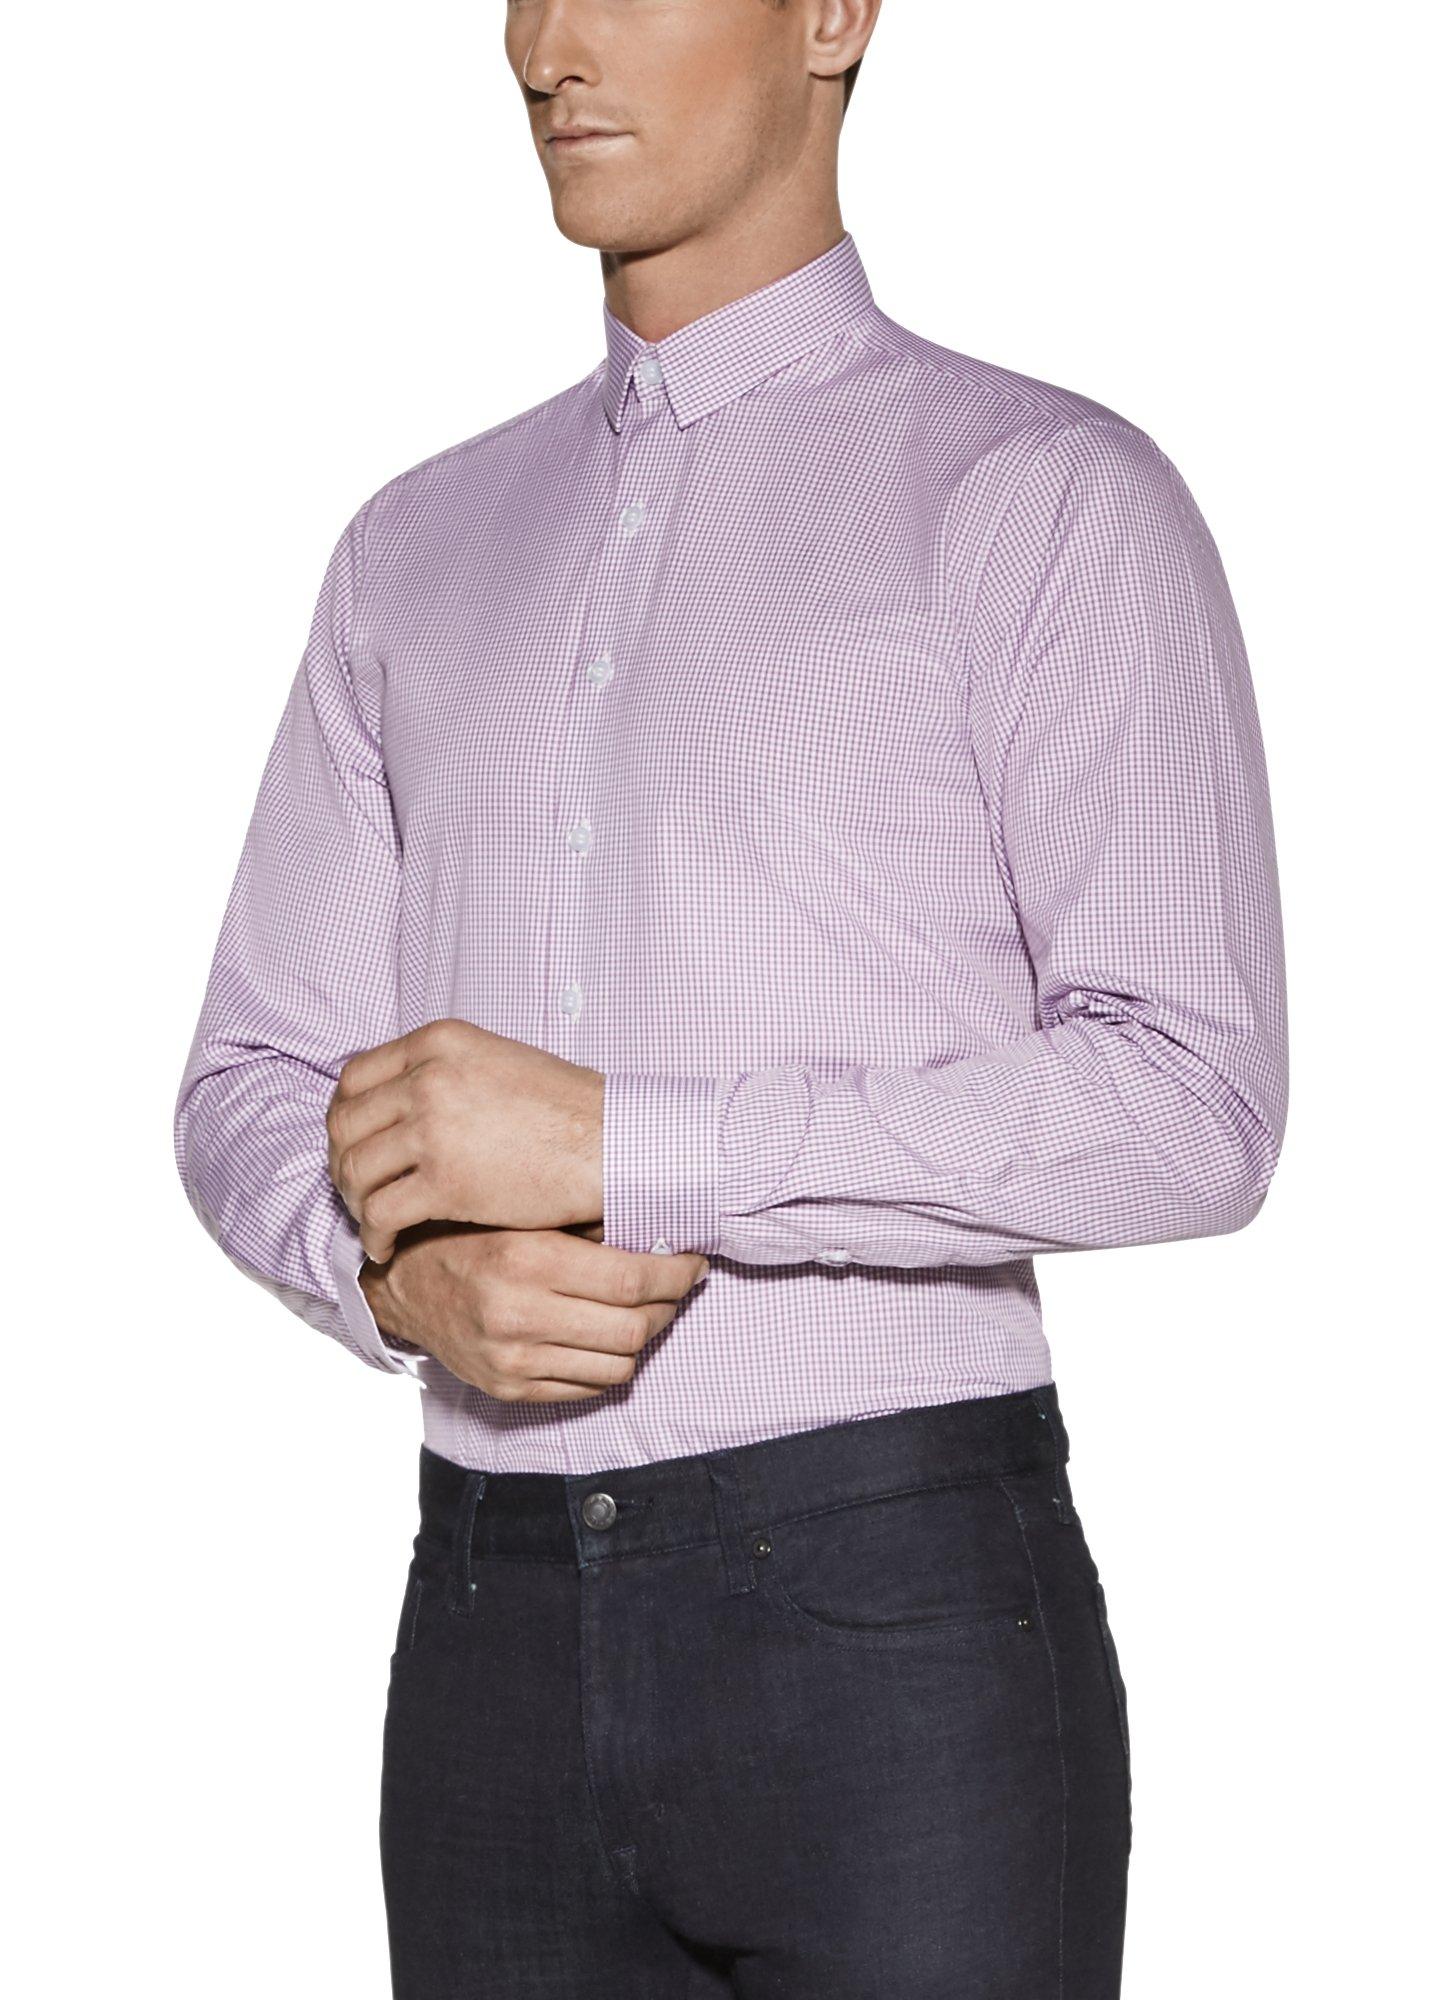 Vardama Men's Gingham Checks Performance Dress Shirt Bethesda With Sweat Resistant Technology (Large) by Vardama